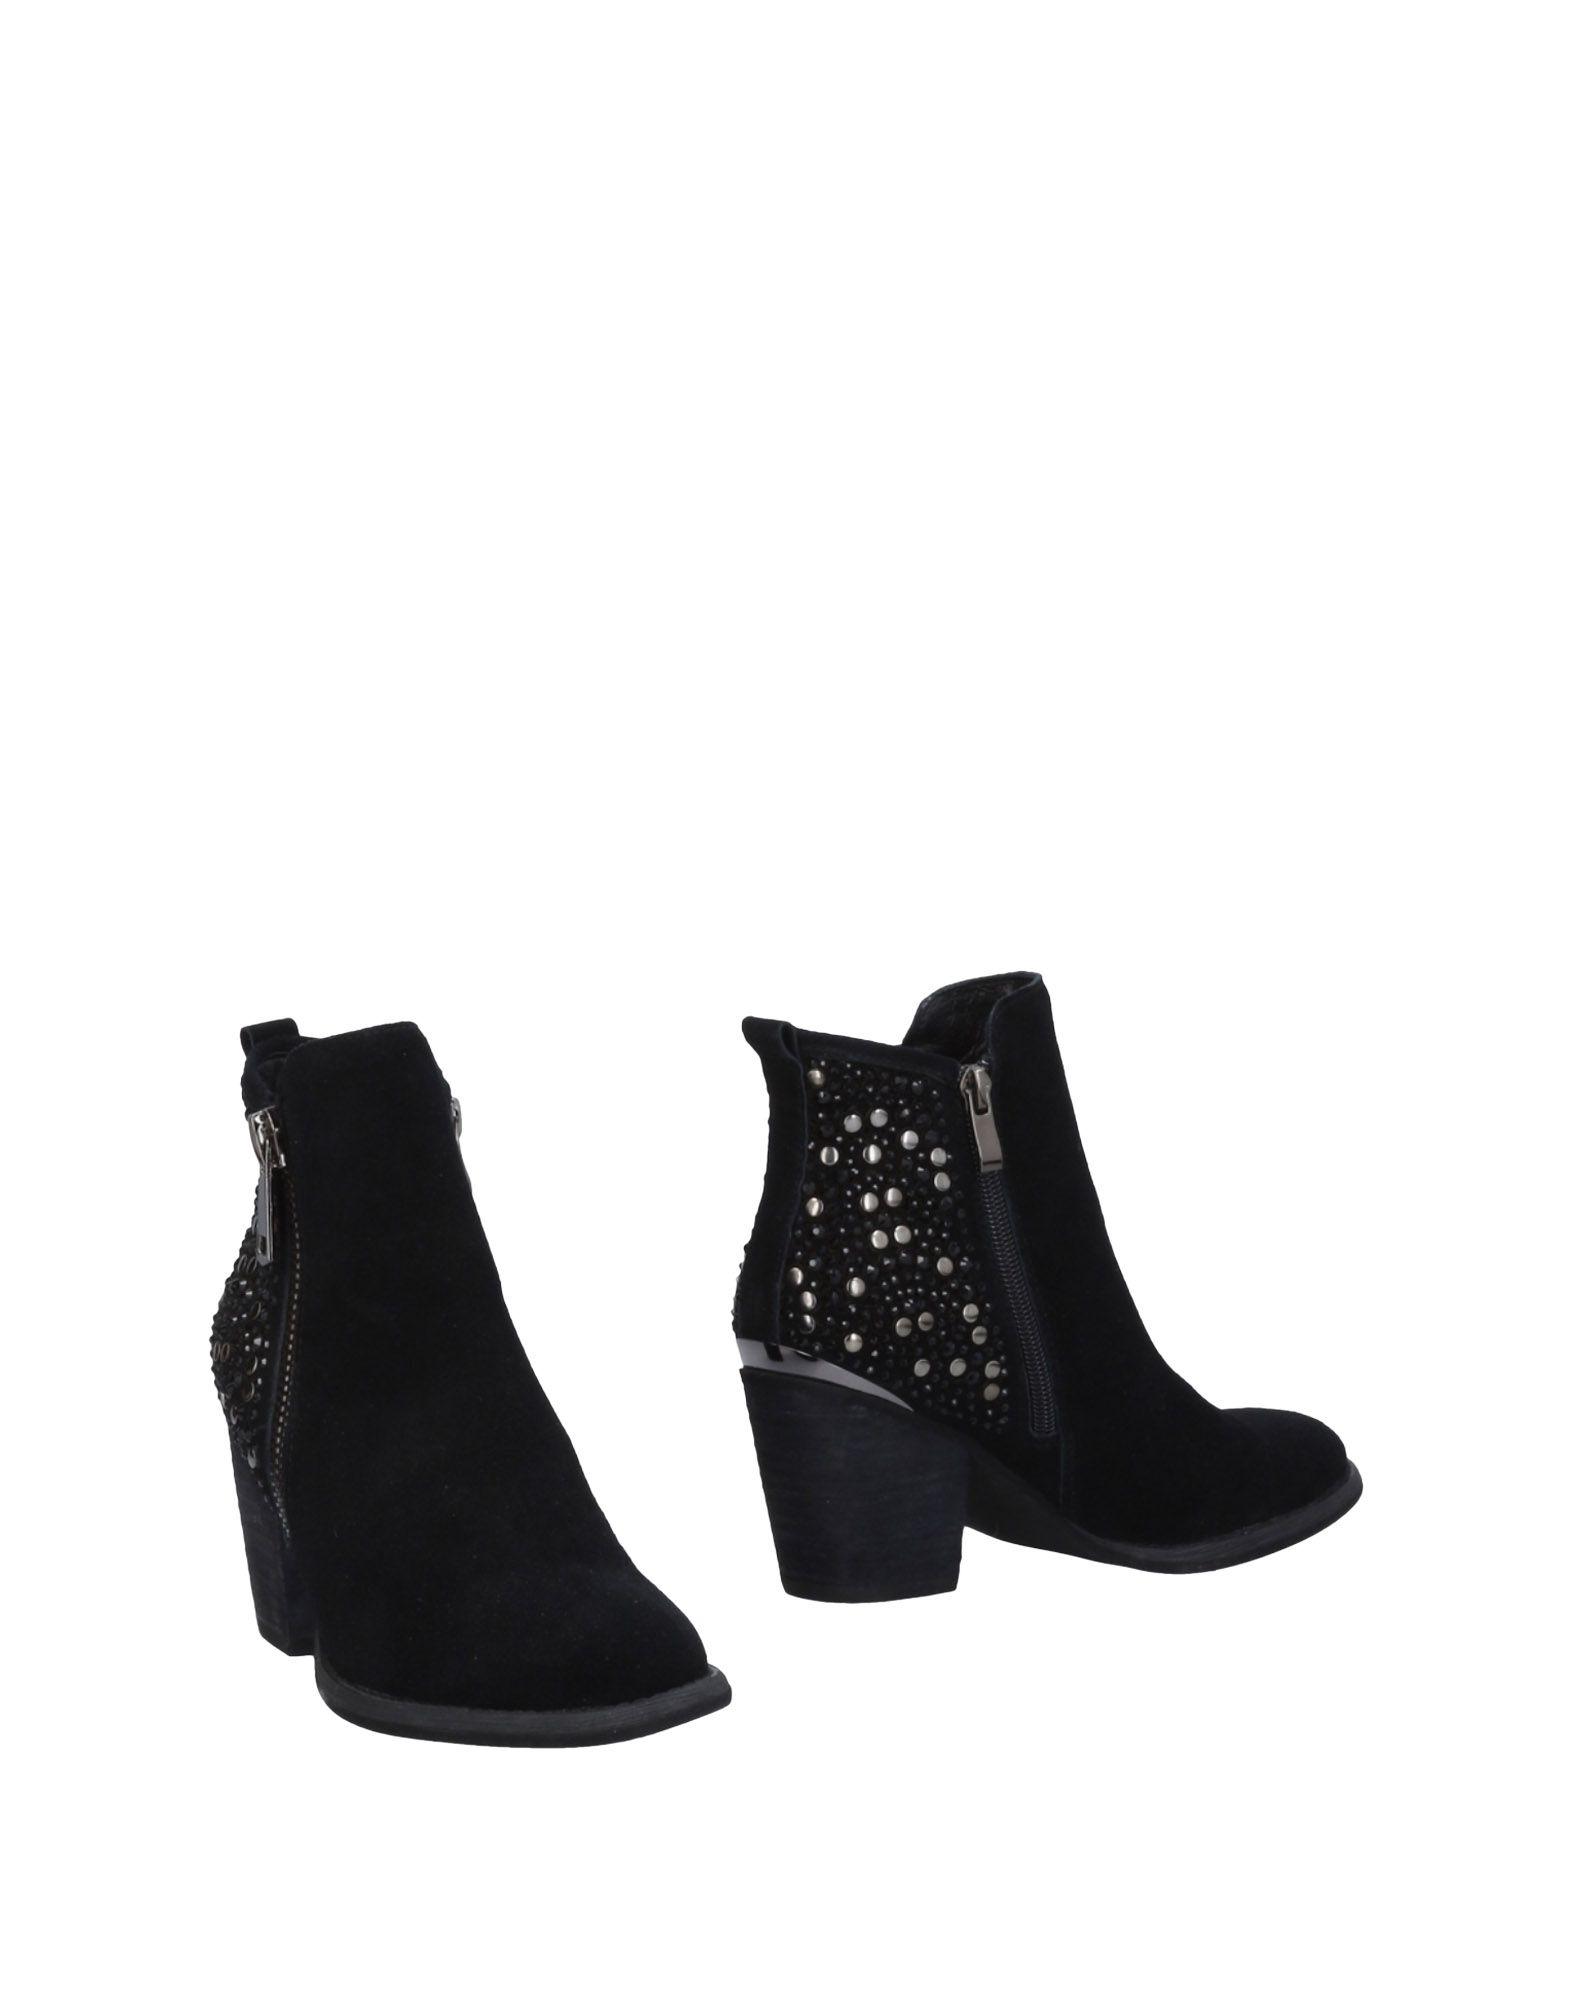 Alma En Pena. Stiefelette Damen  11459841OG Gute Qualität beliebte Schuhe